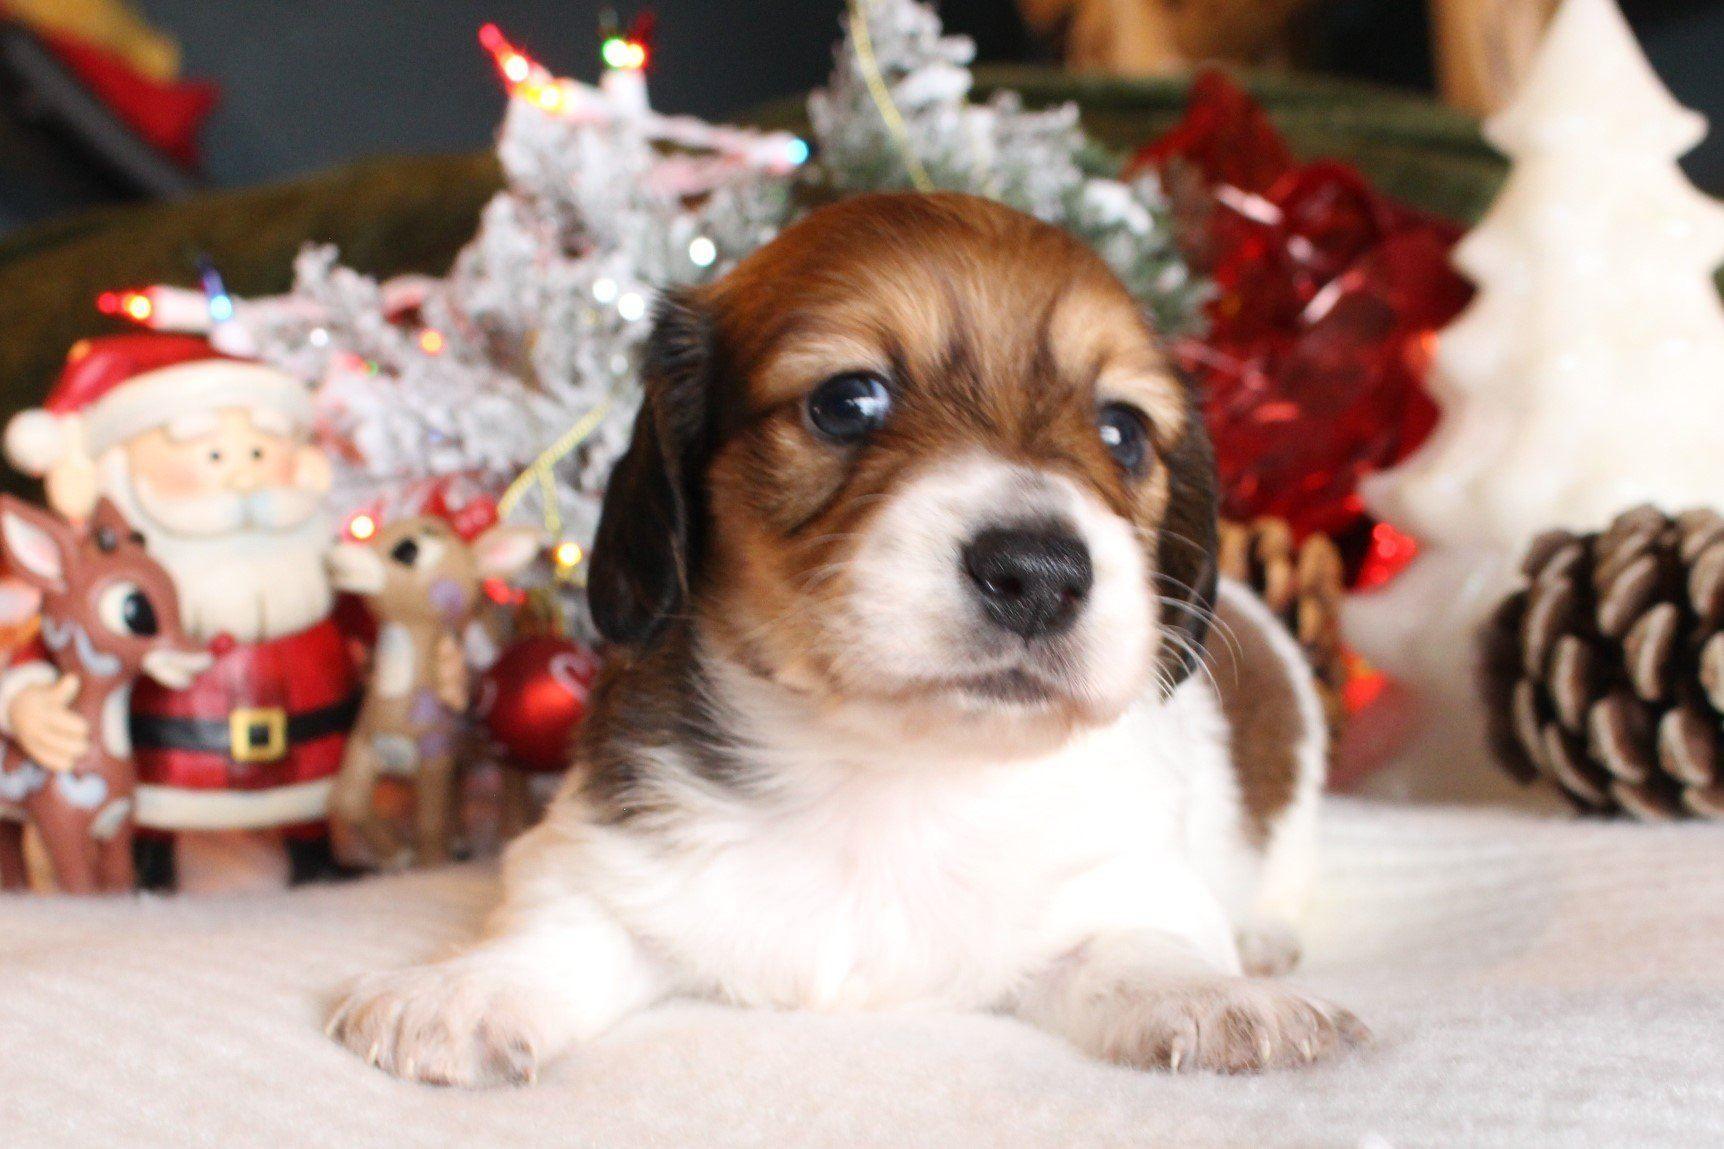 Gallery Dachshund puppies for sale, Dachshund puppies